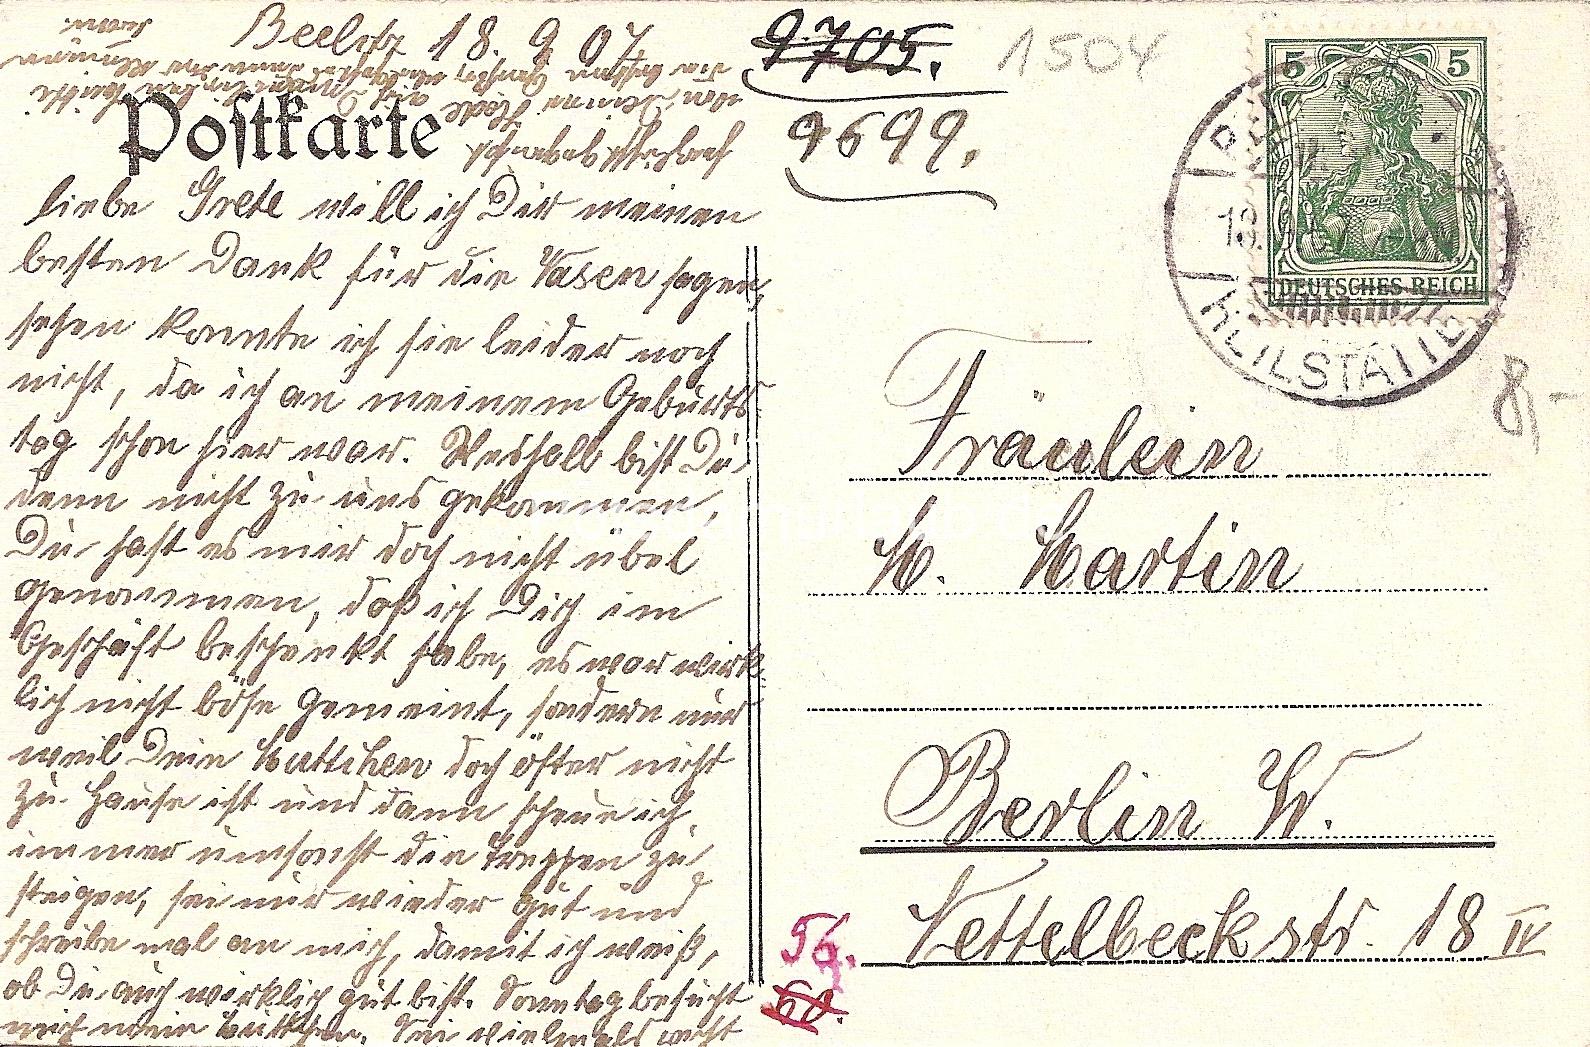 1907 09 18